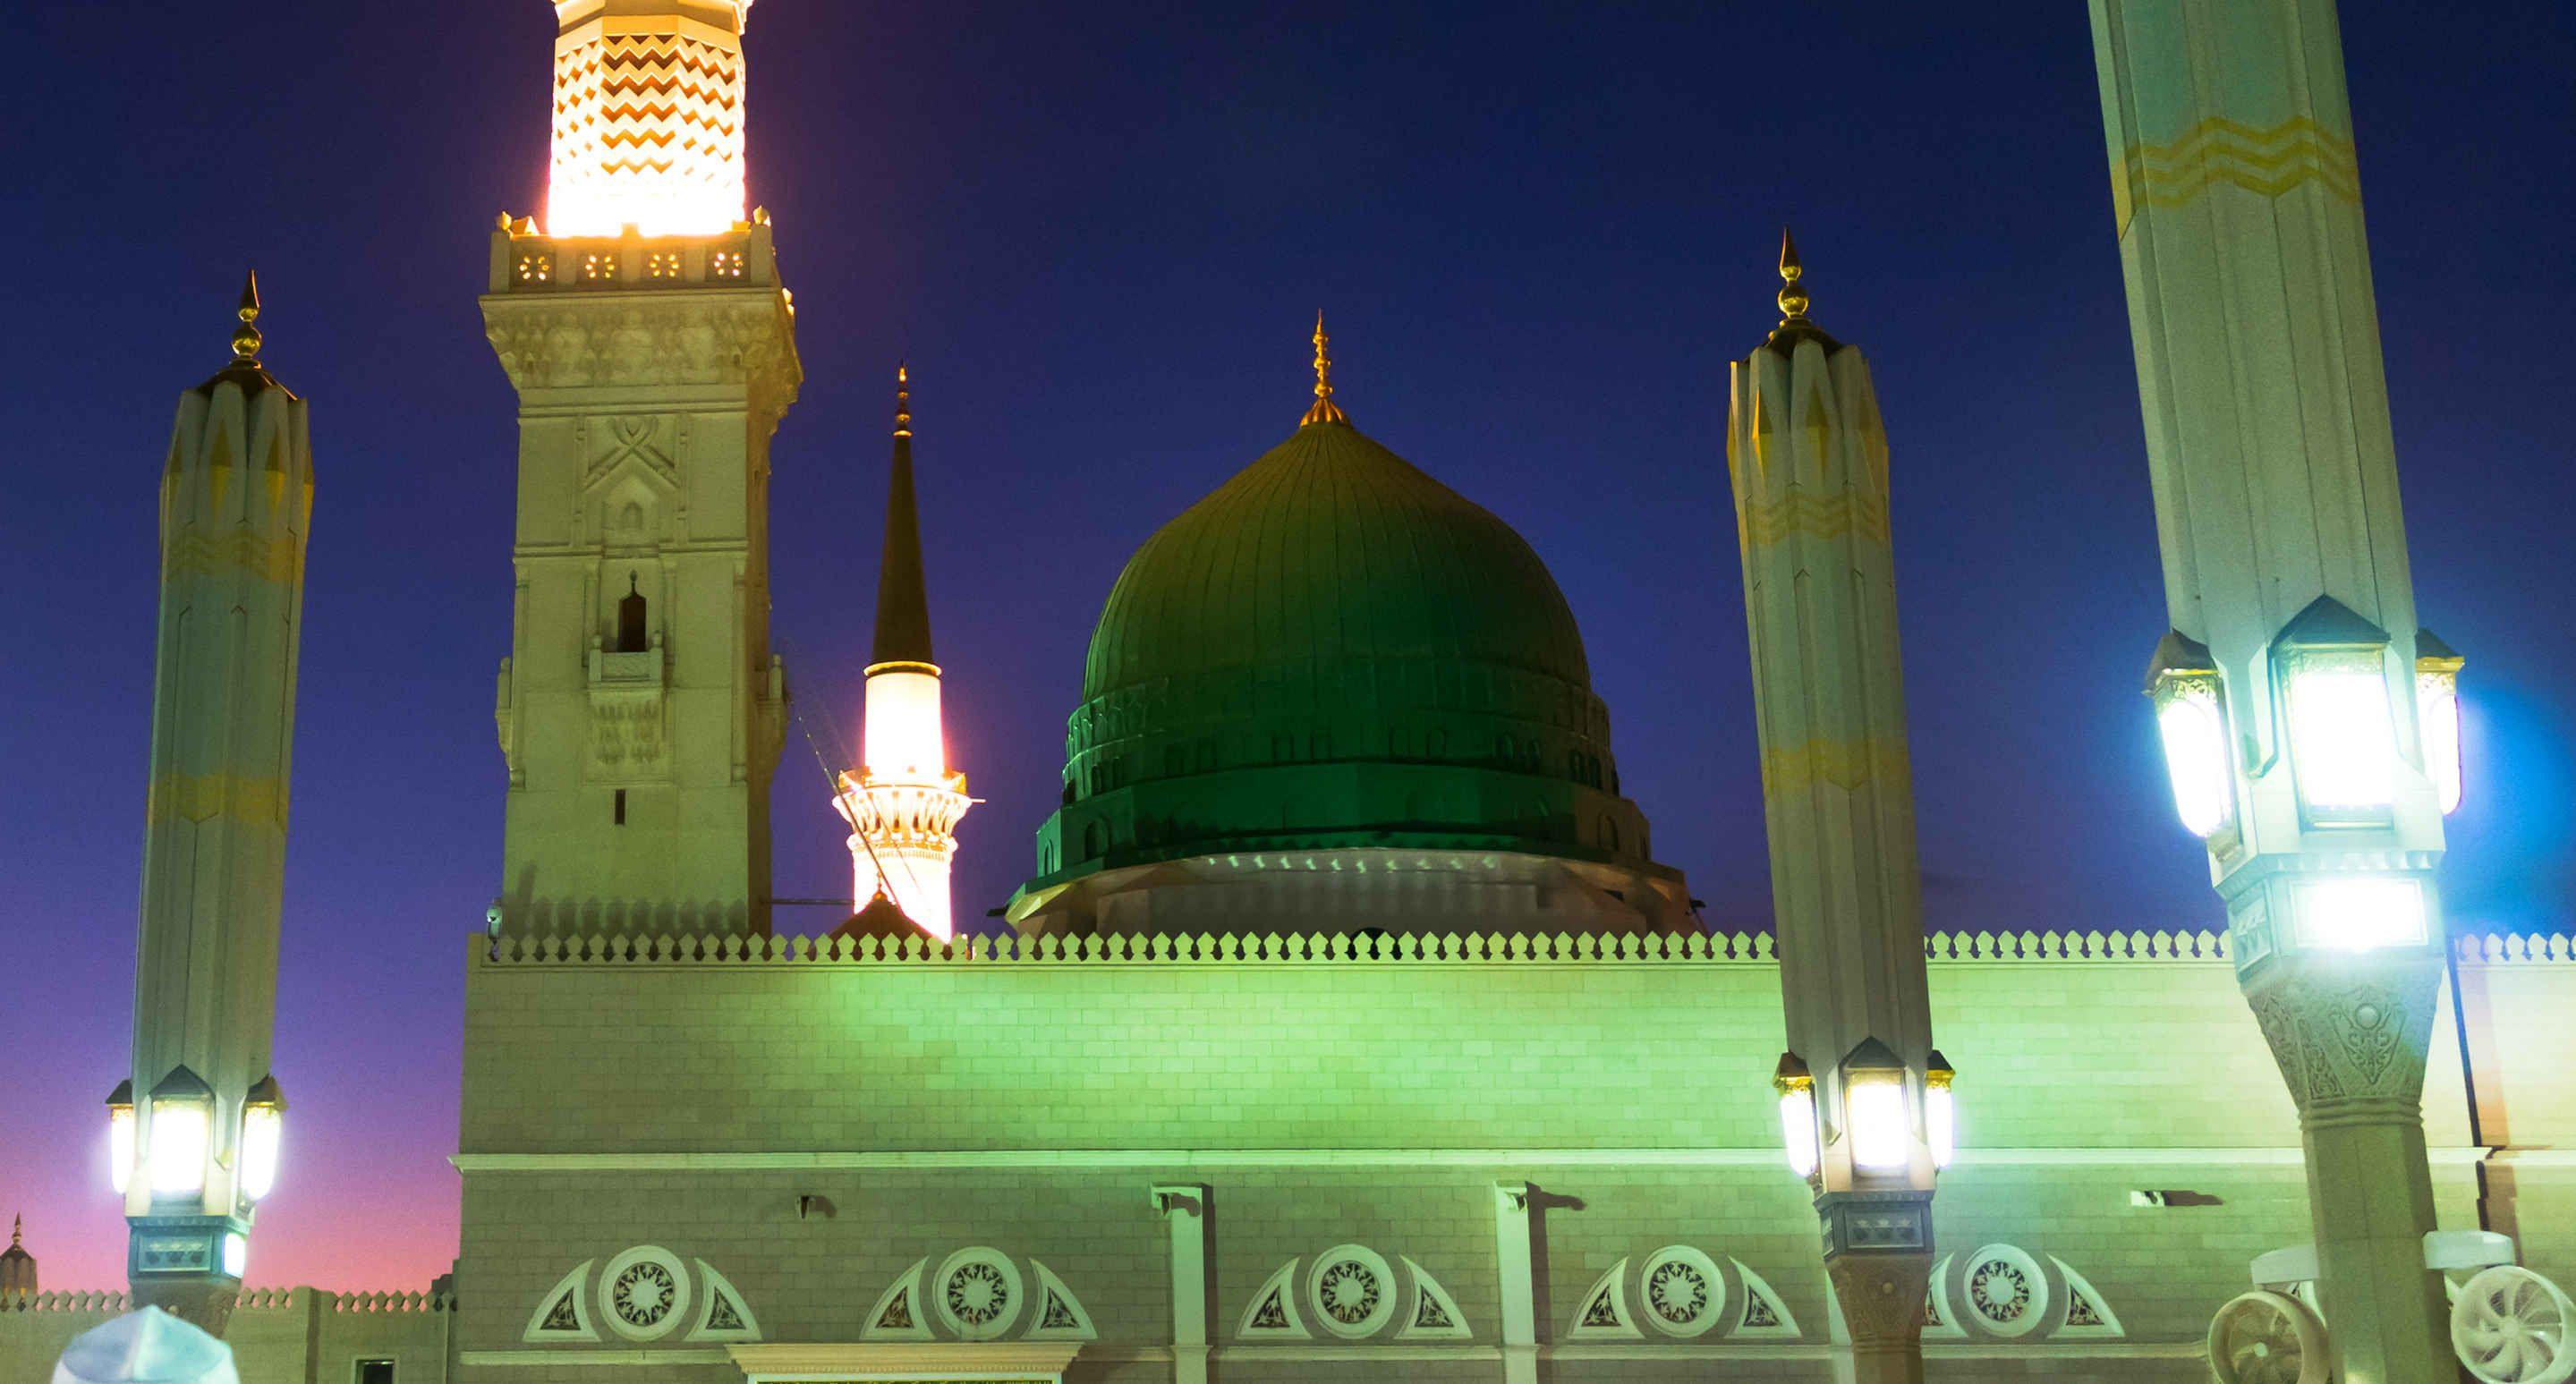 Umrah Banner: Book Ramadan Umrah Packages And We Offer 5 Star, 4 Star, 3